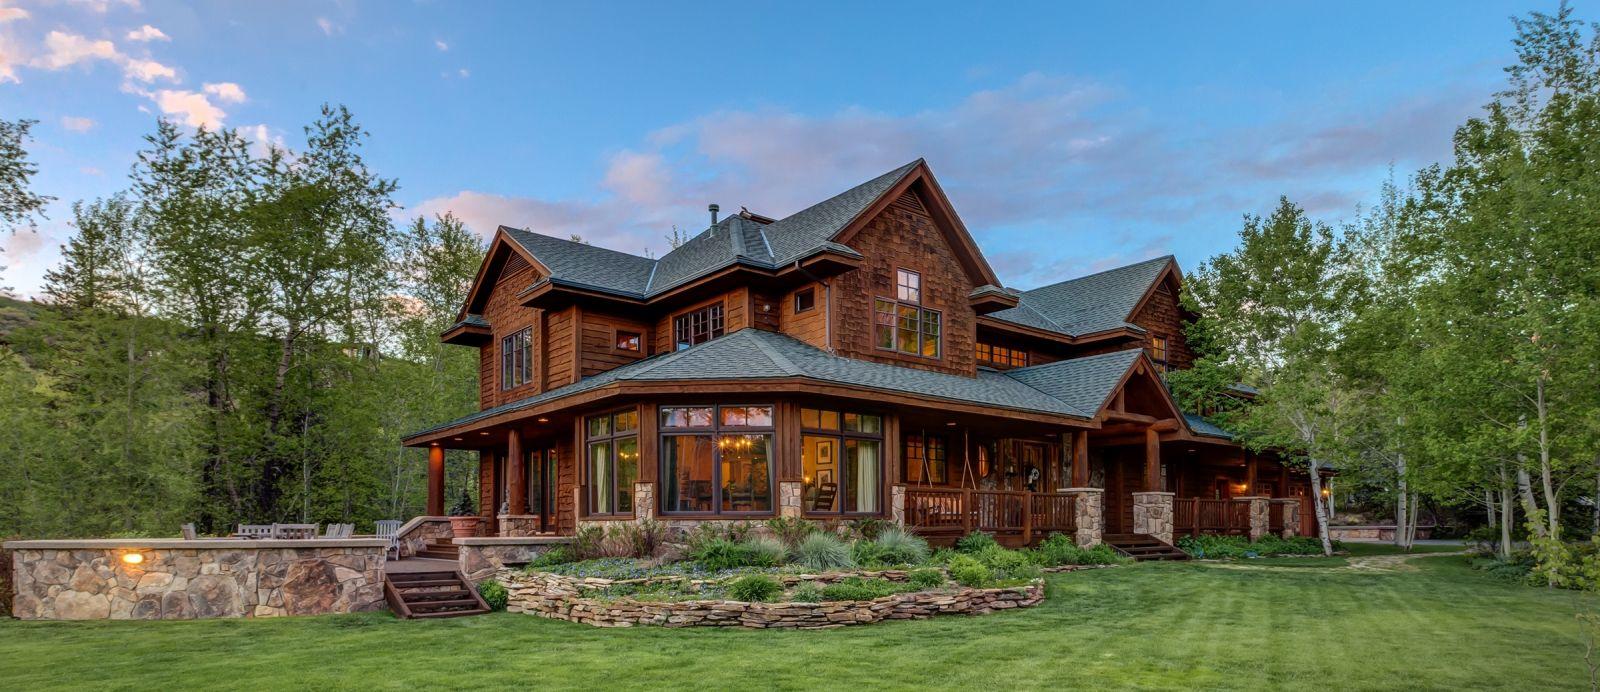 Steamboat Springs Real Estate Homes For Sale Realtor